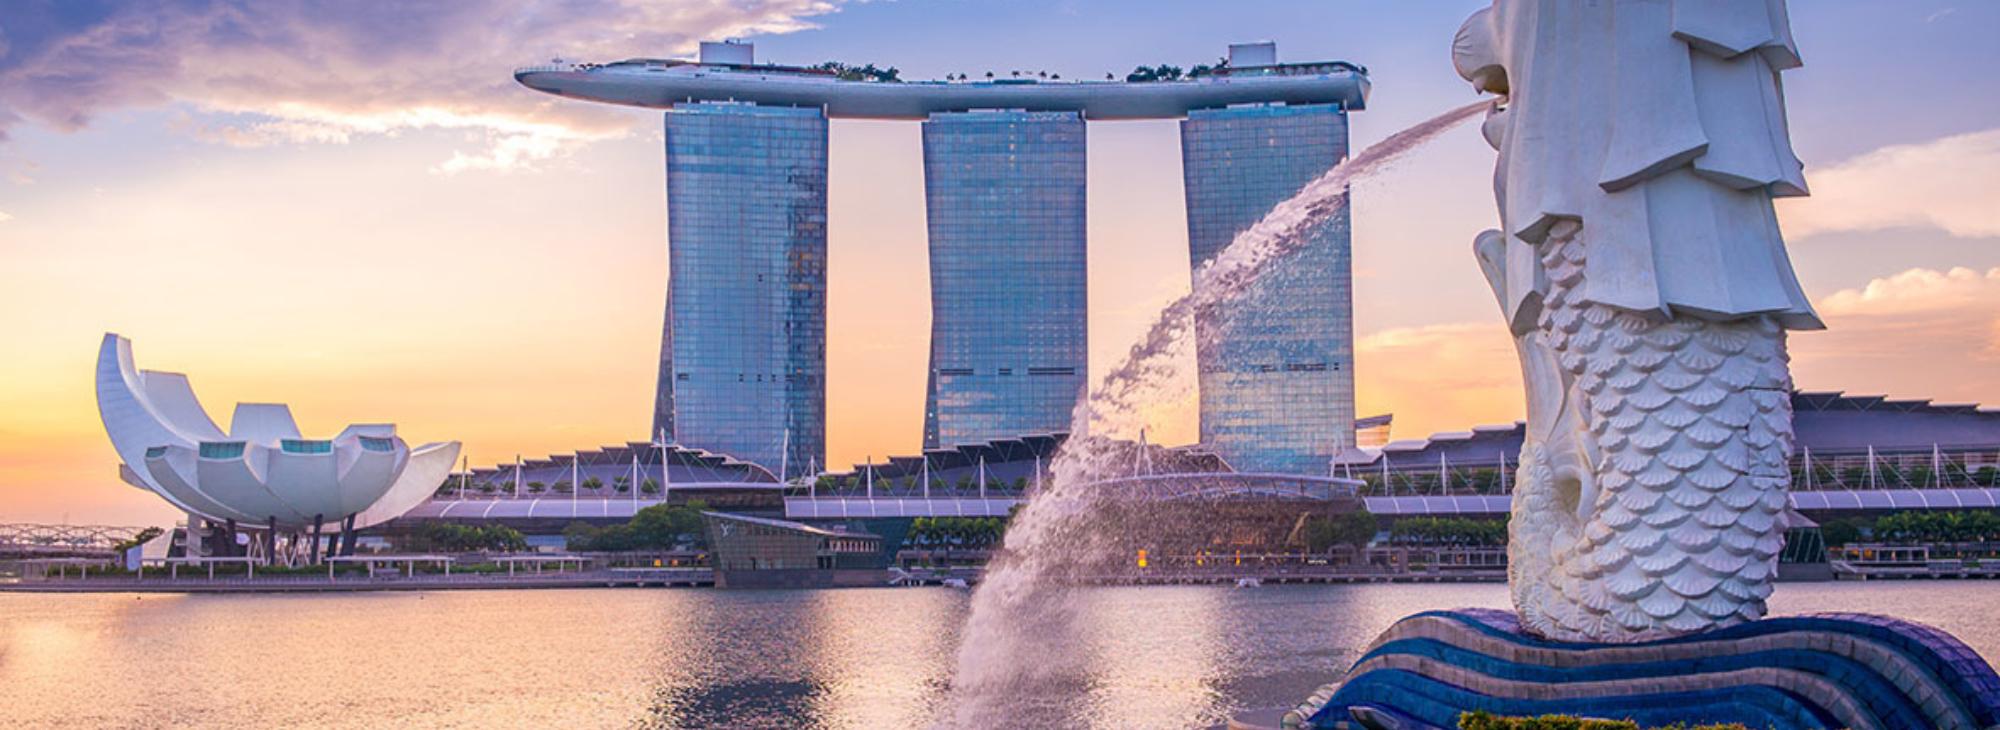 IMPA Singapore 2019 | IMPA Singapore 2019